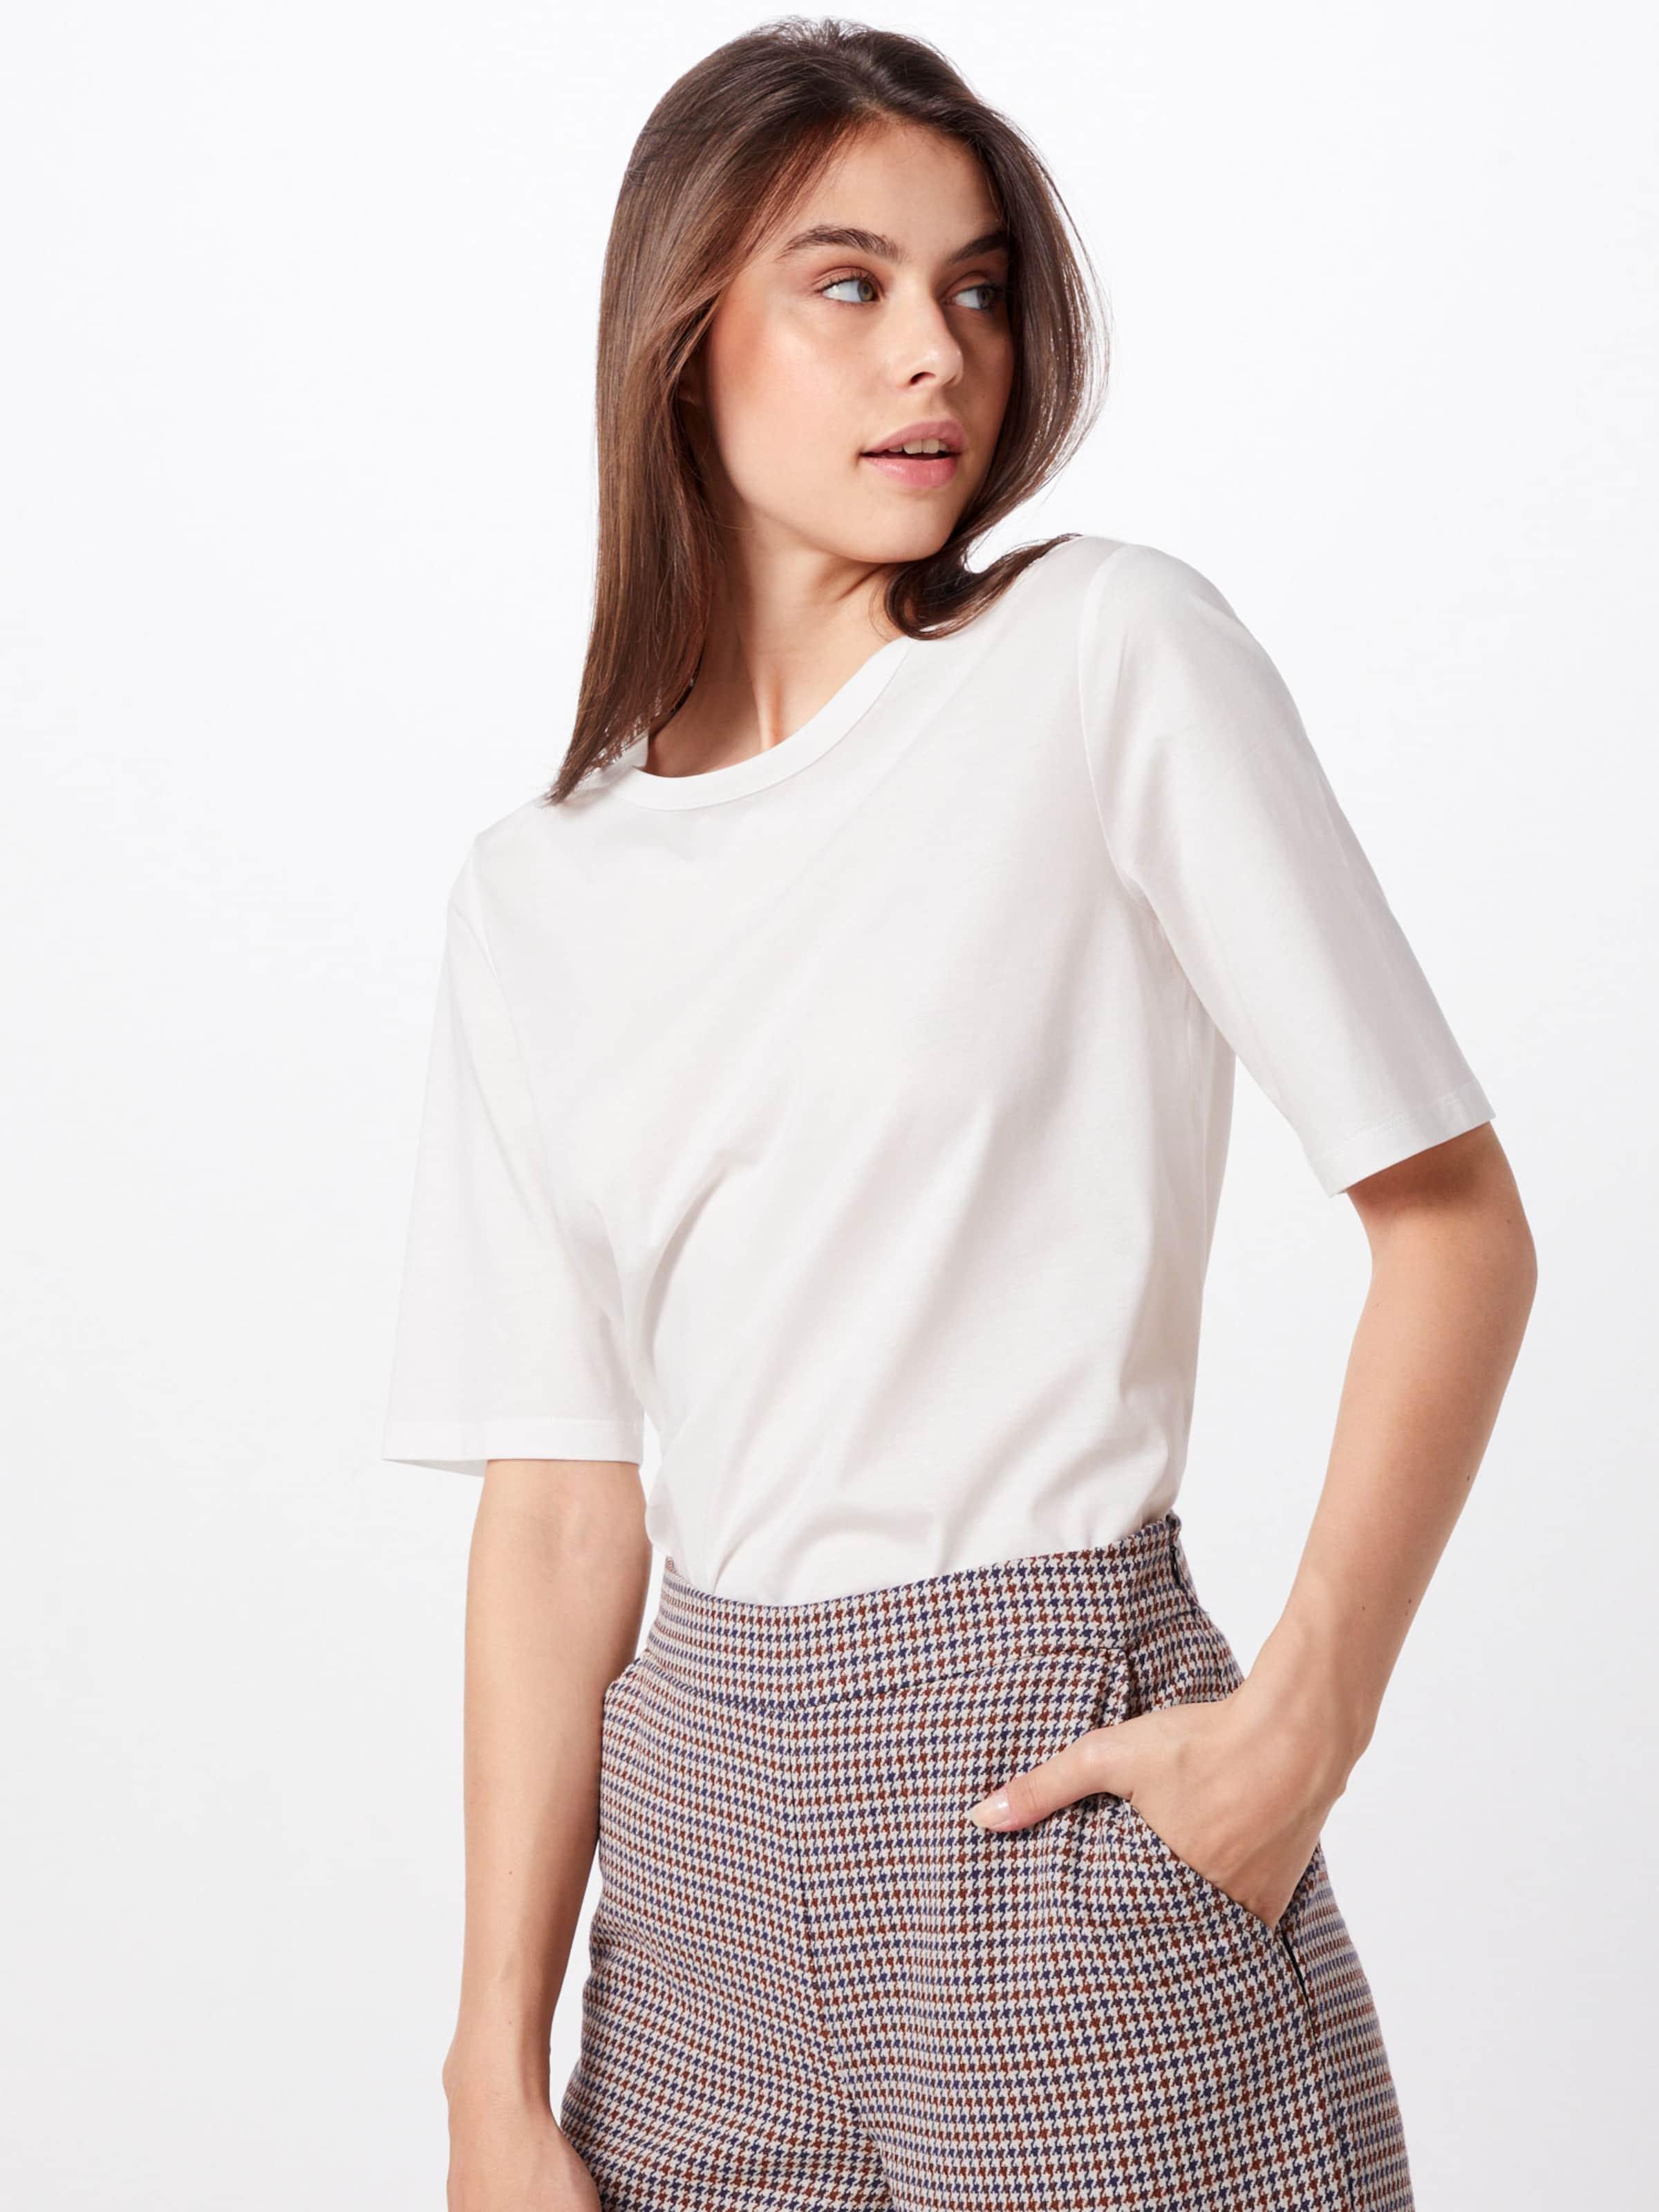 T shirt Blanc En Vila Y6v7yfbg